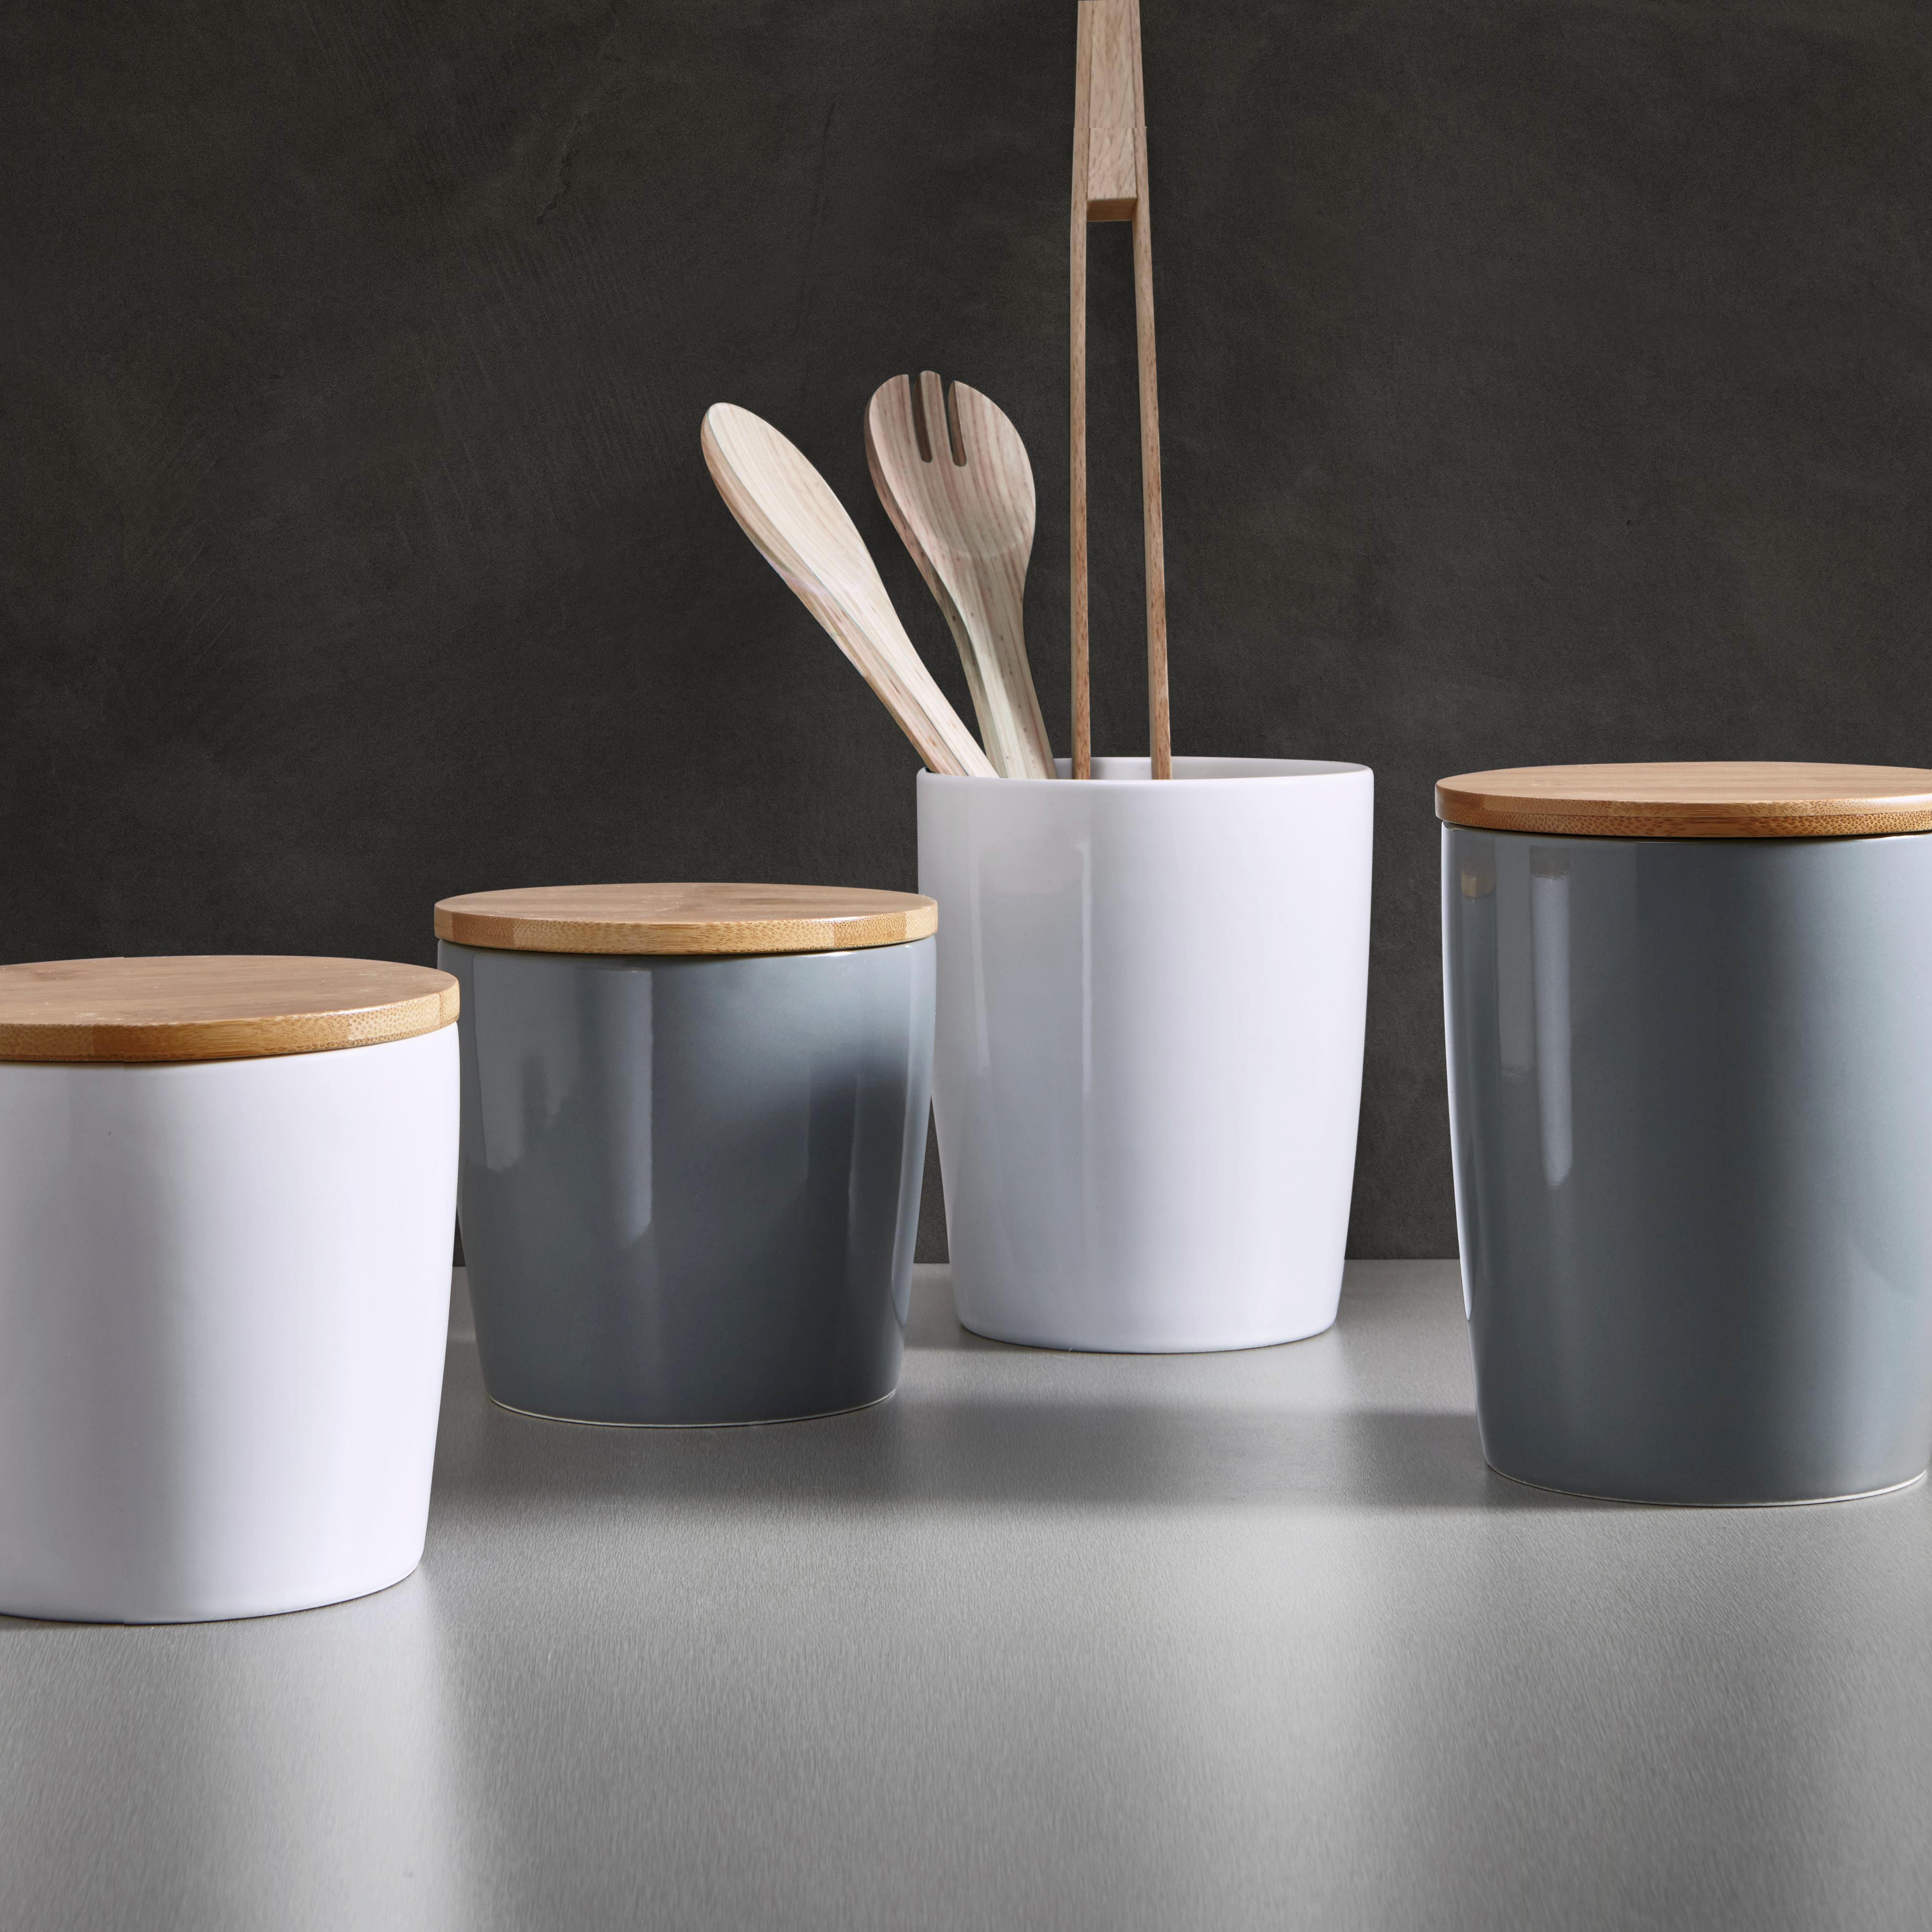 Porzellandose Haku mit Deckel - Naturfarben/Weiß, MODERN, Holz/Keramik (13/13cm) - MÖMAX modern living